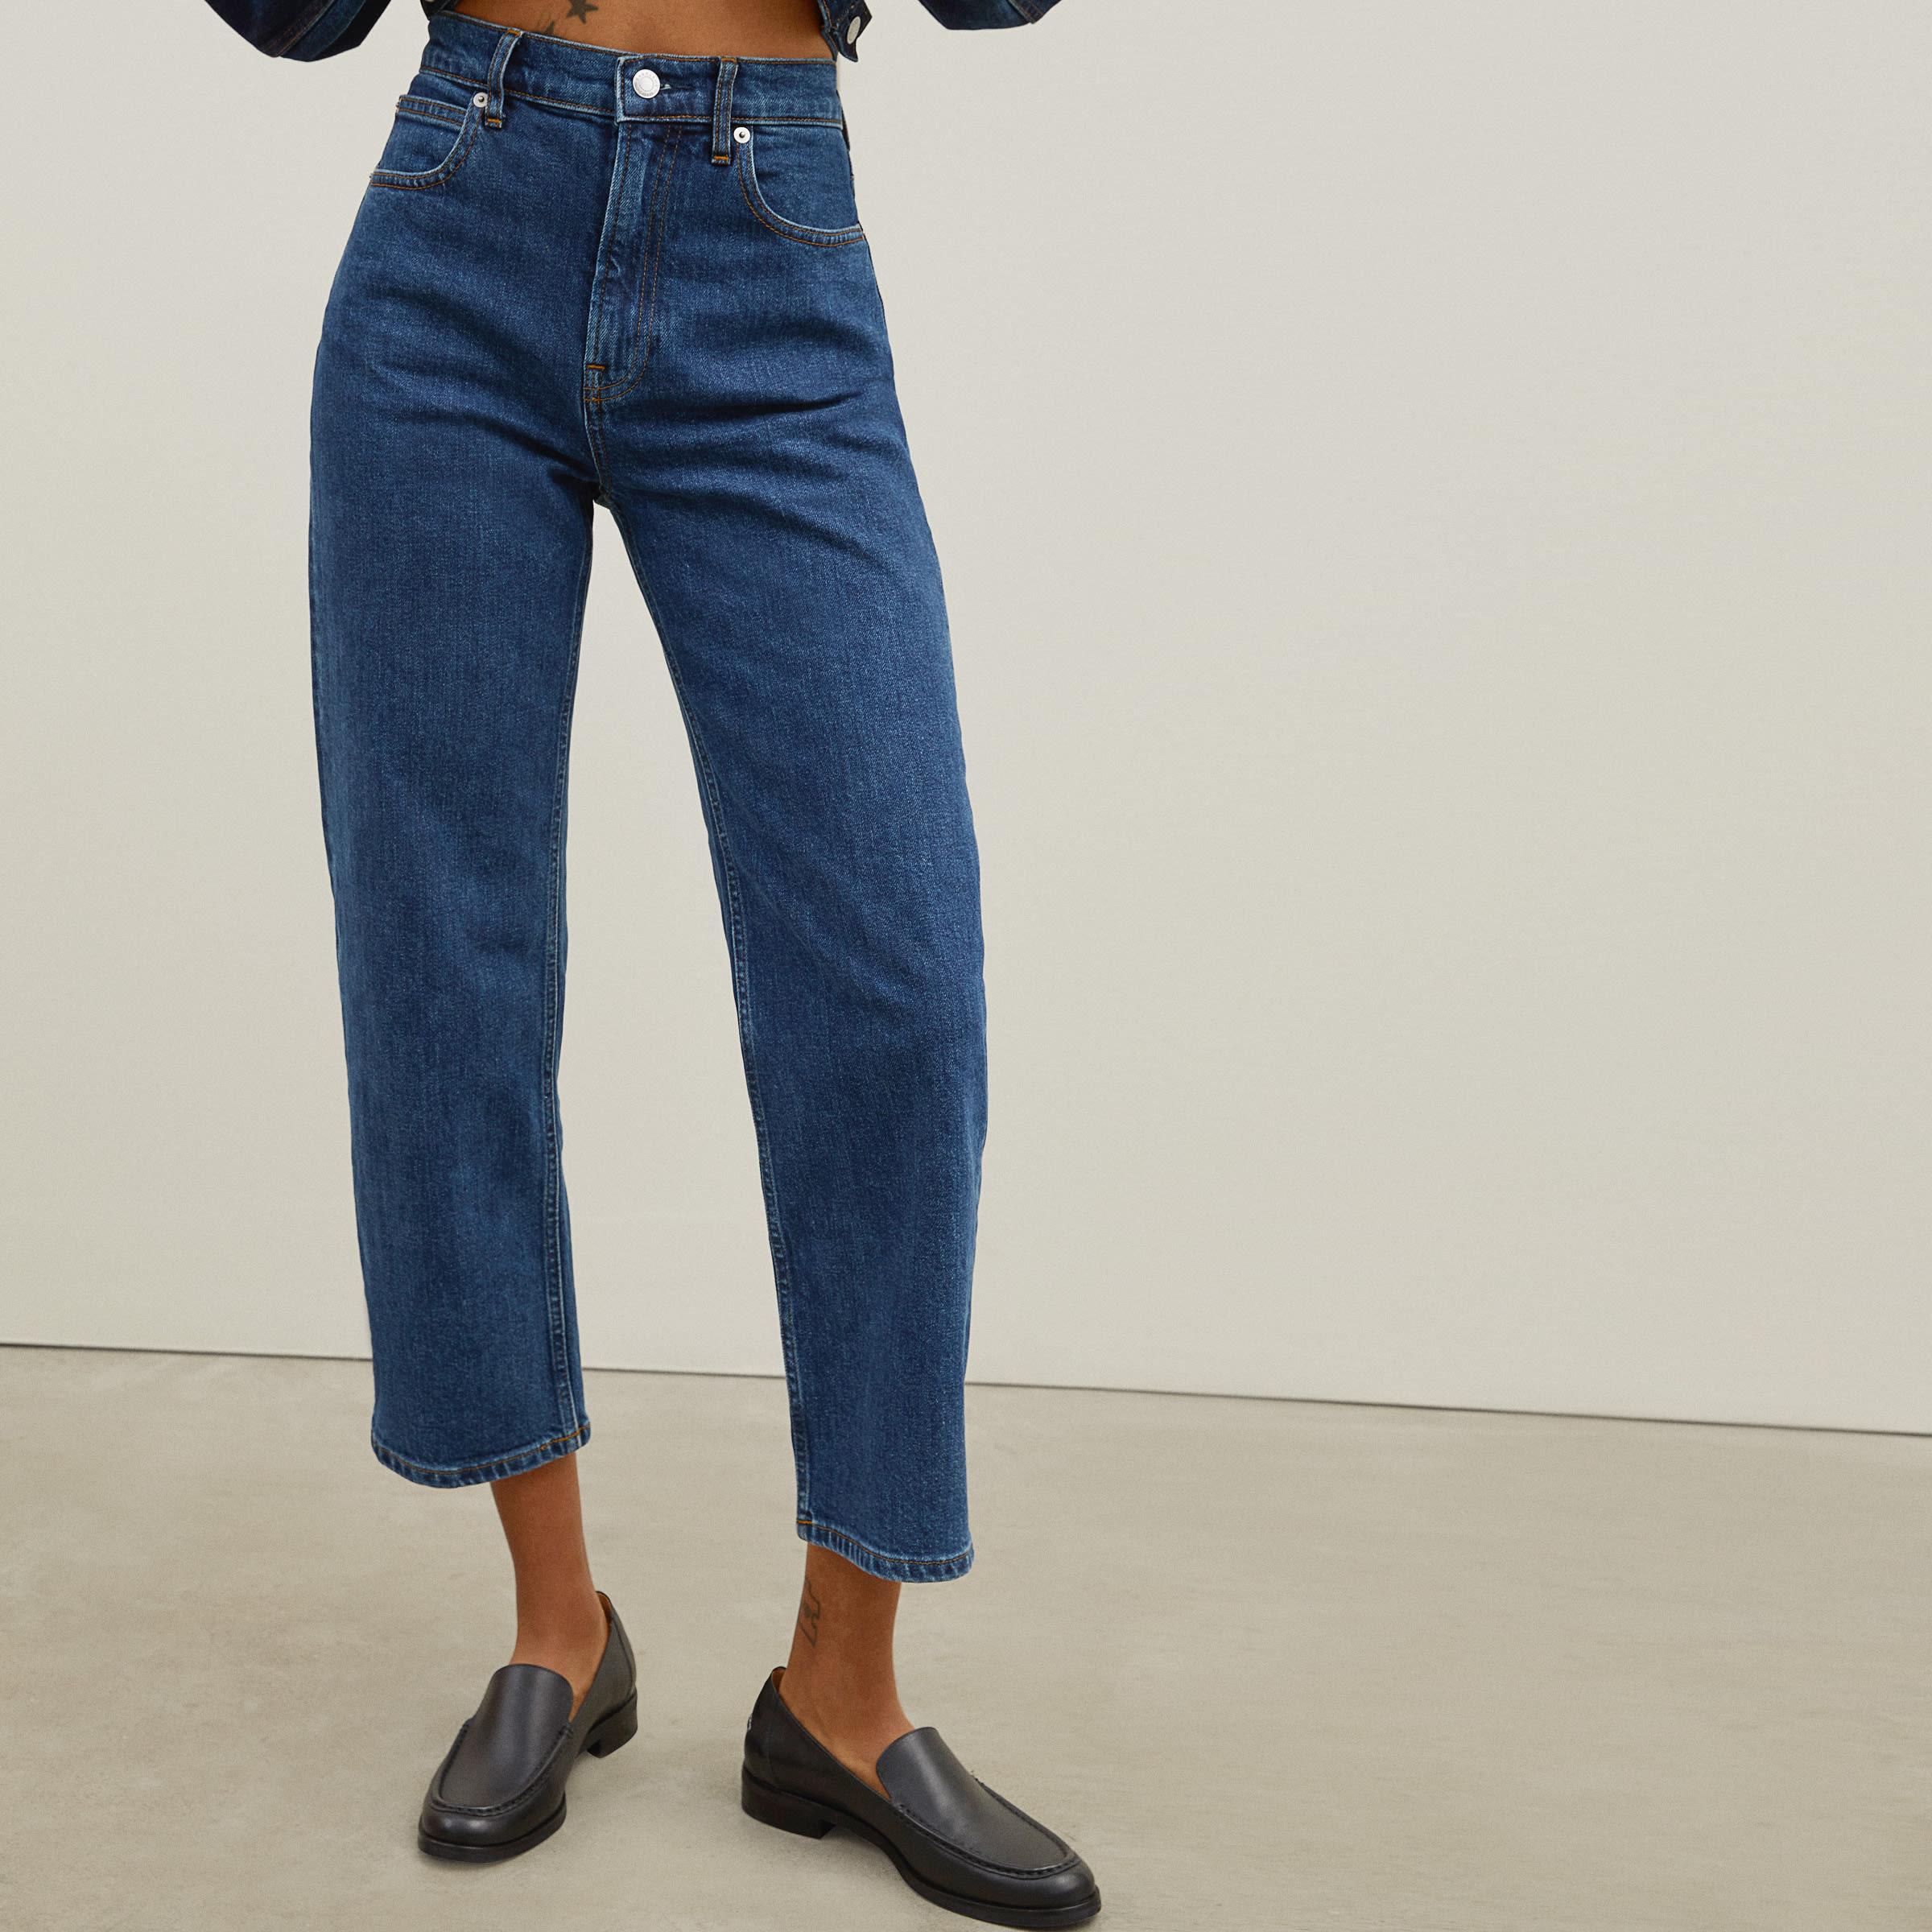 The Way-High Jean